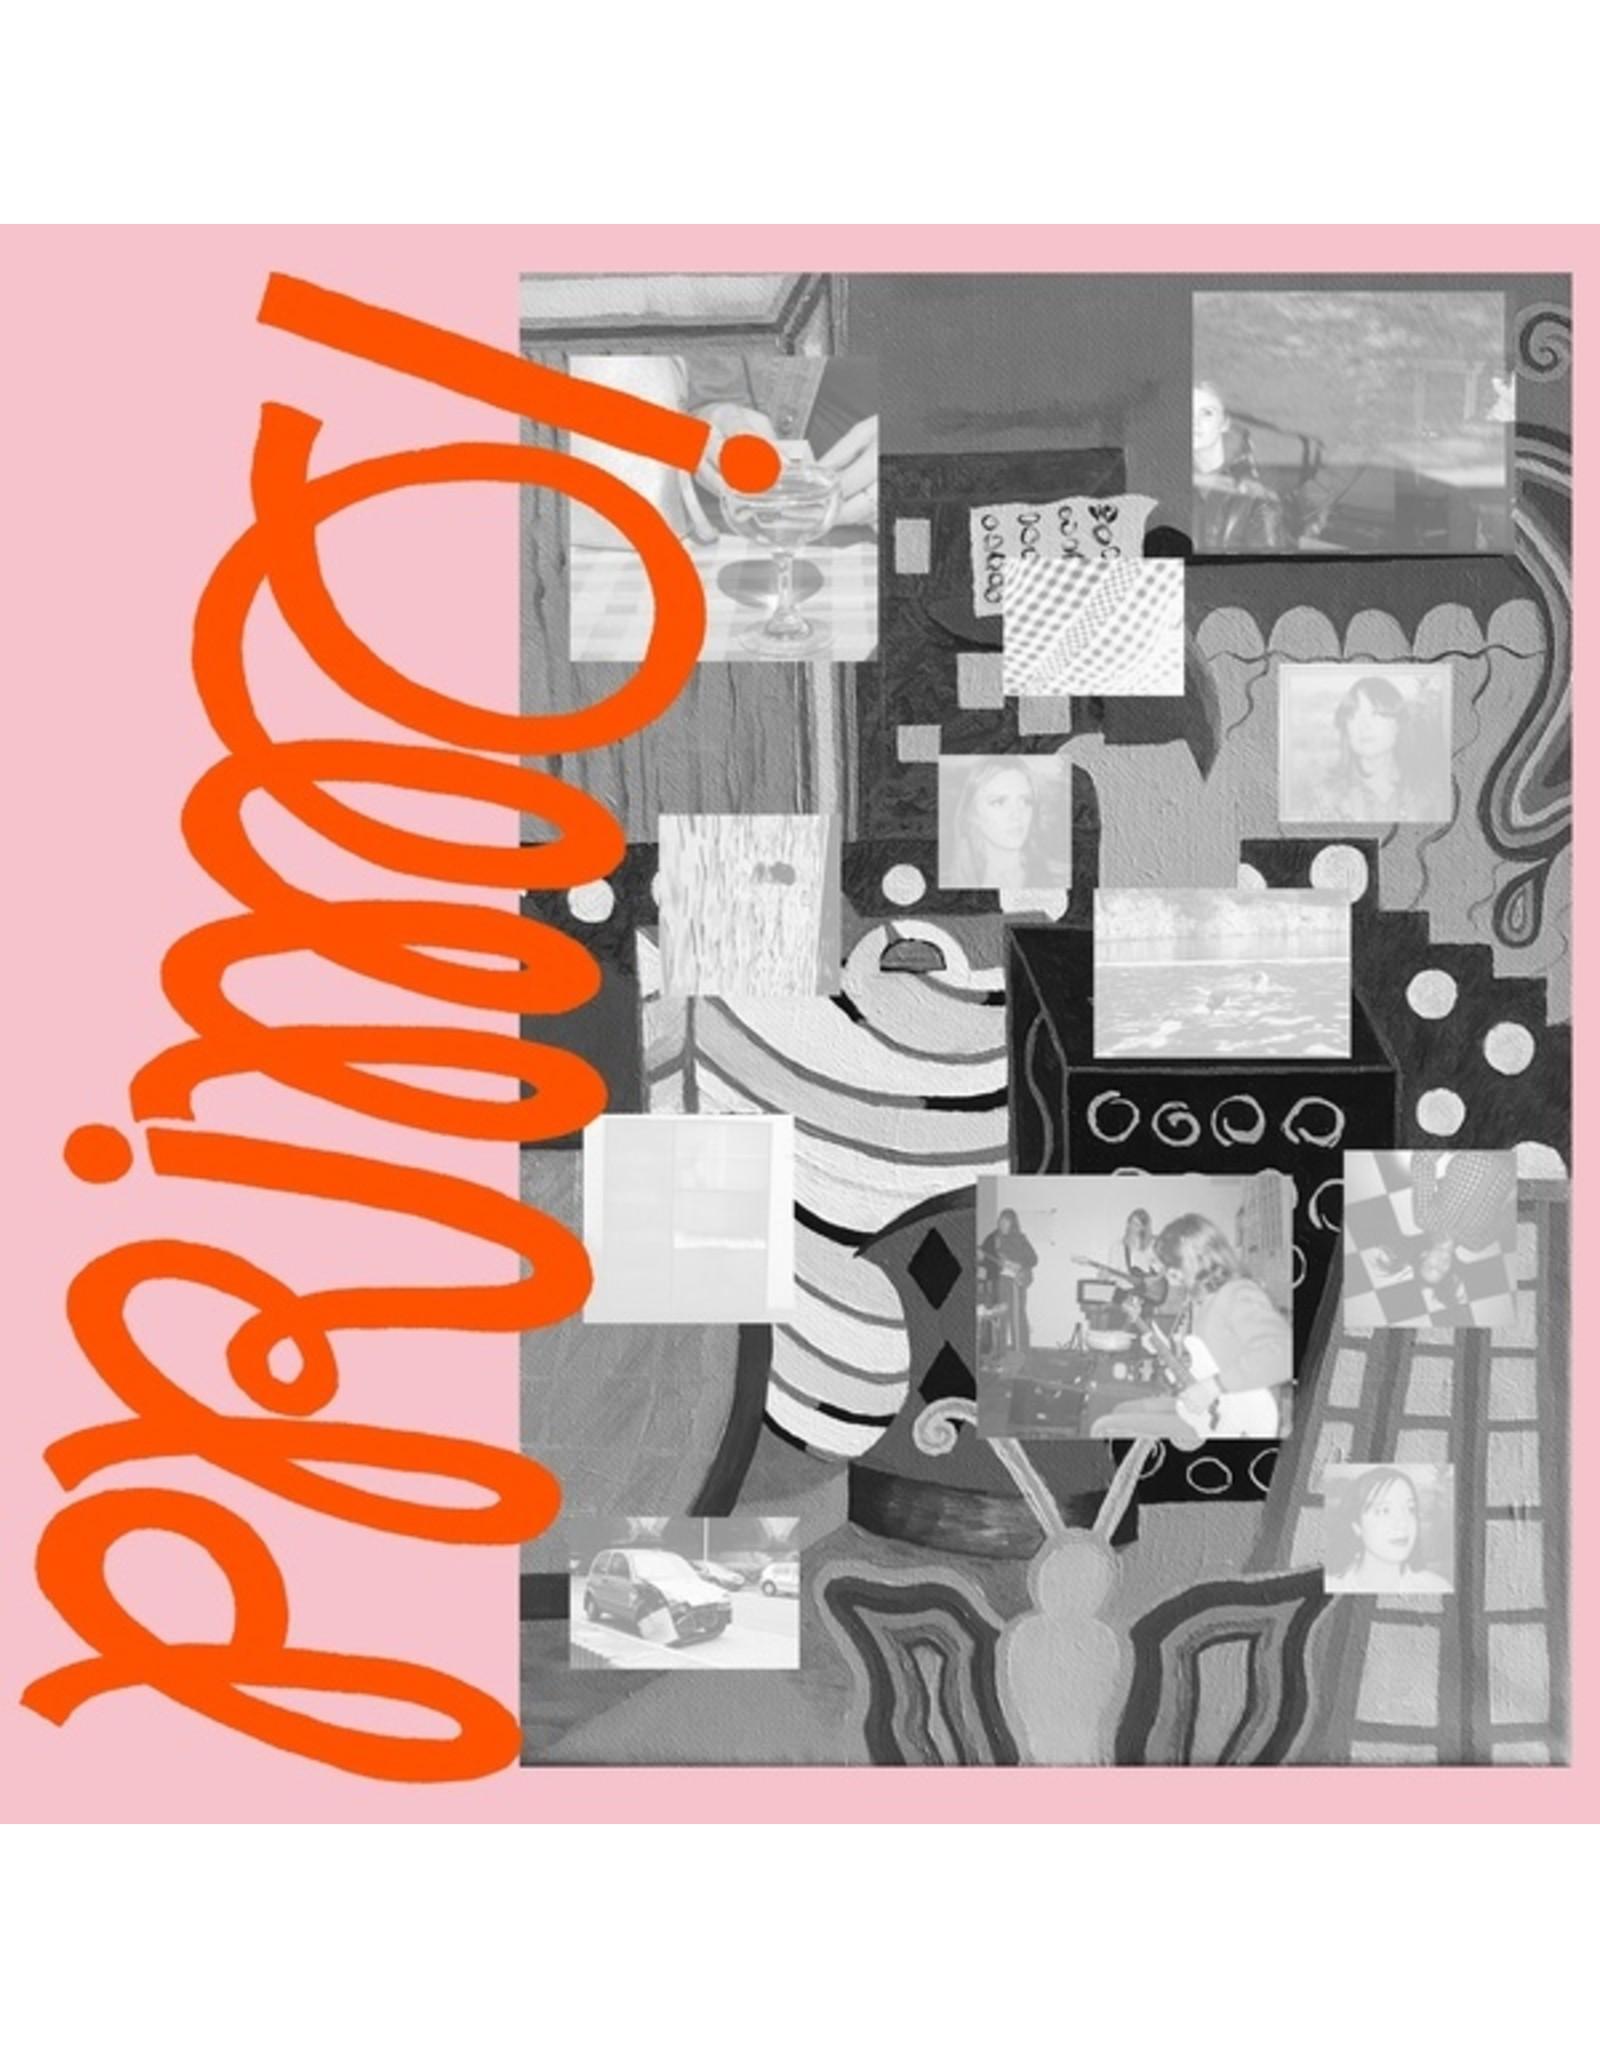 New Vinyl Primo! - Sogni LP